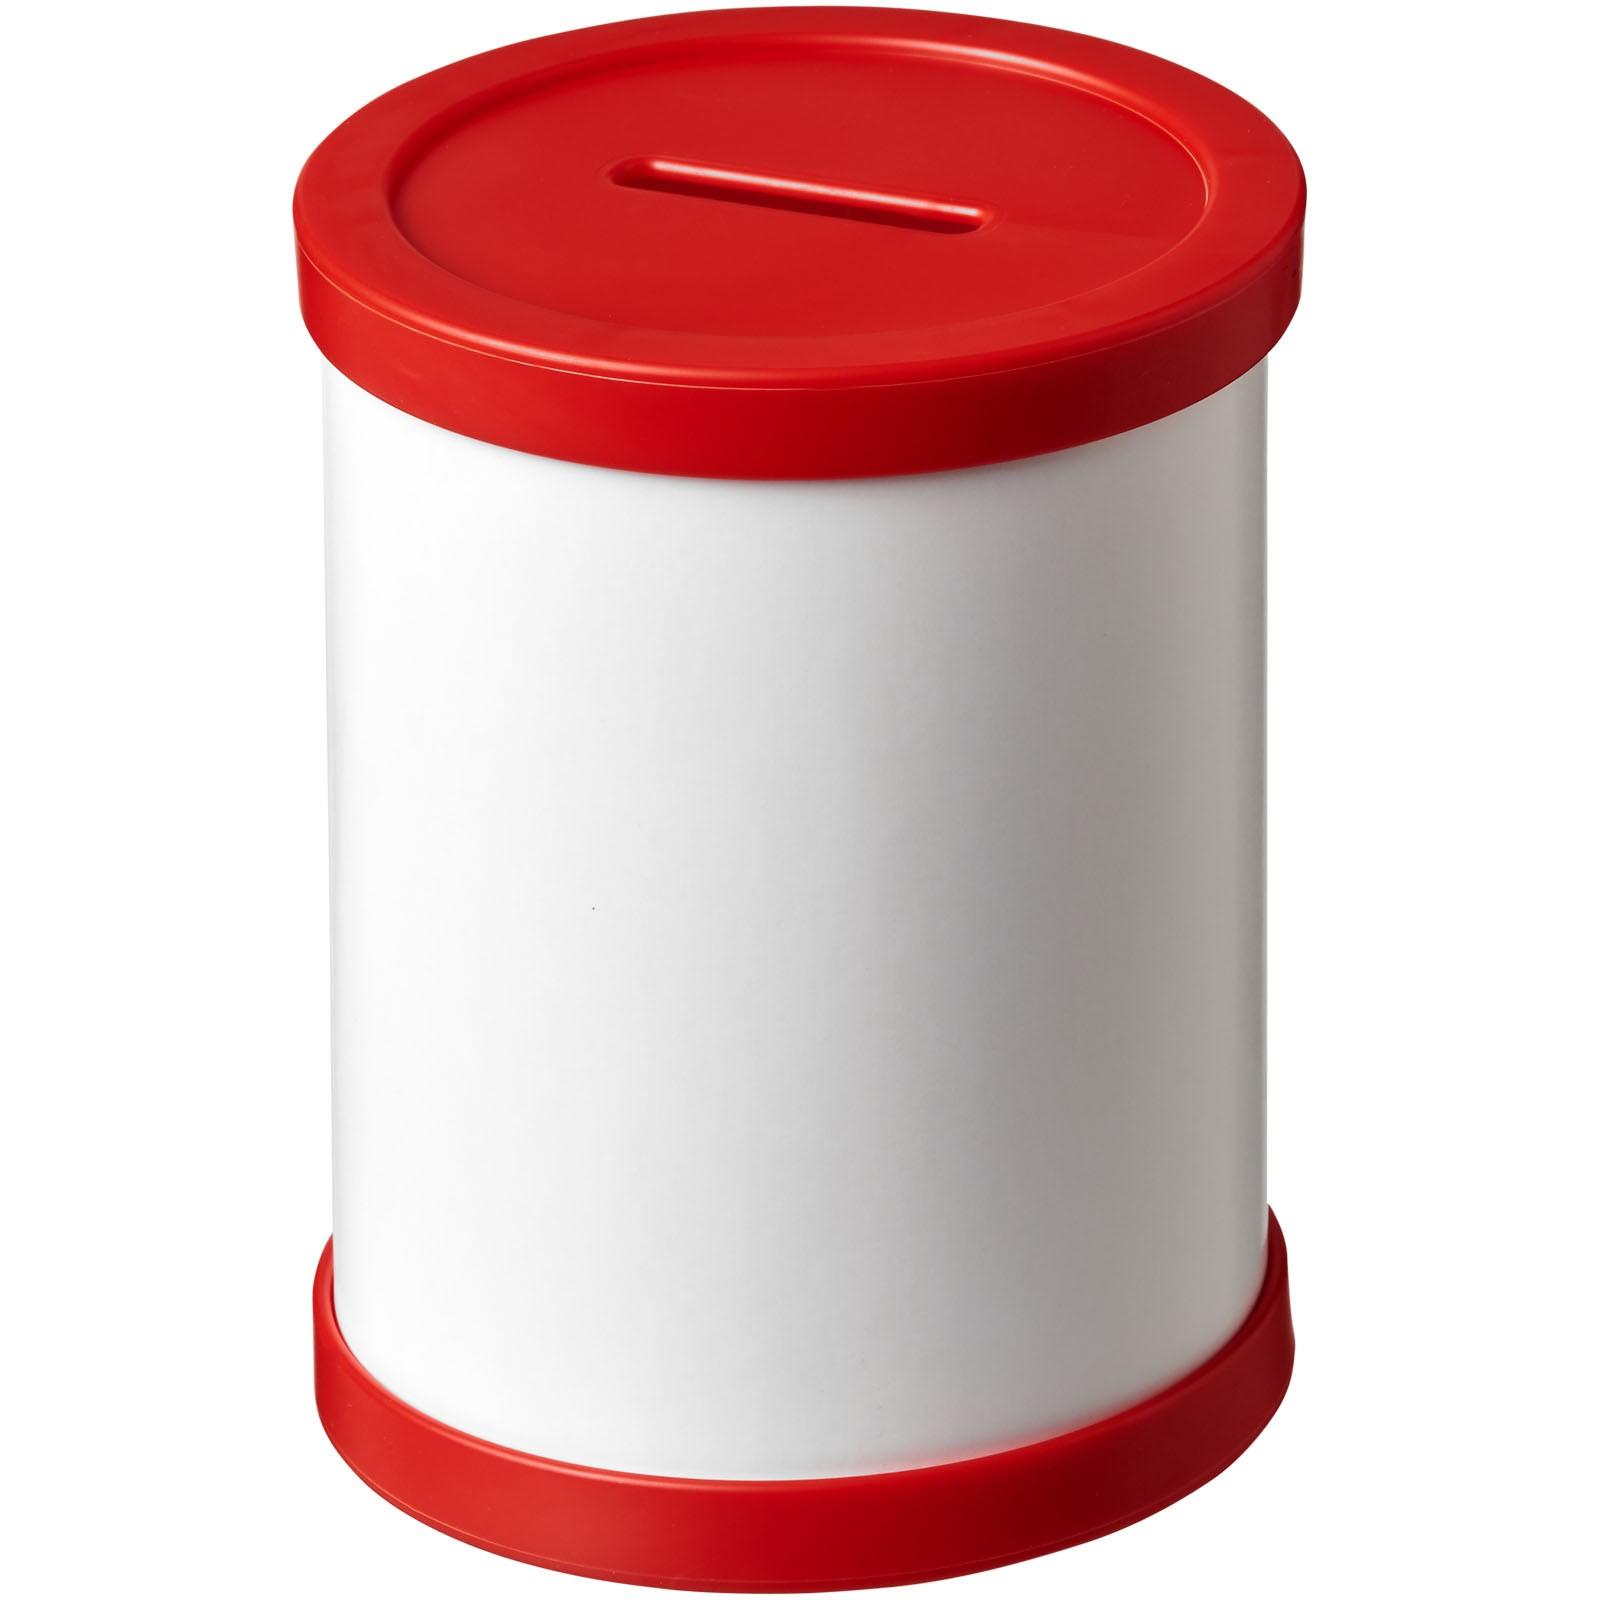 Deva round card pen holder with plastic trim - Red